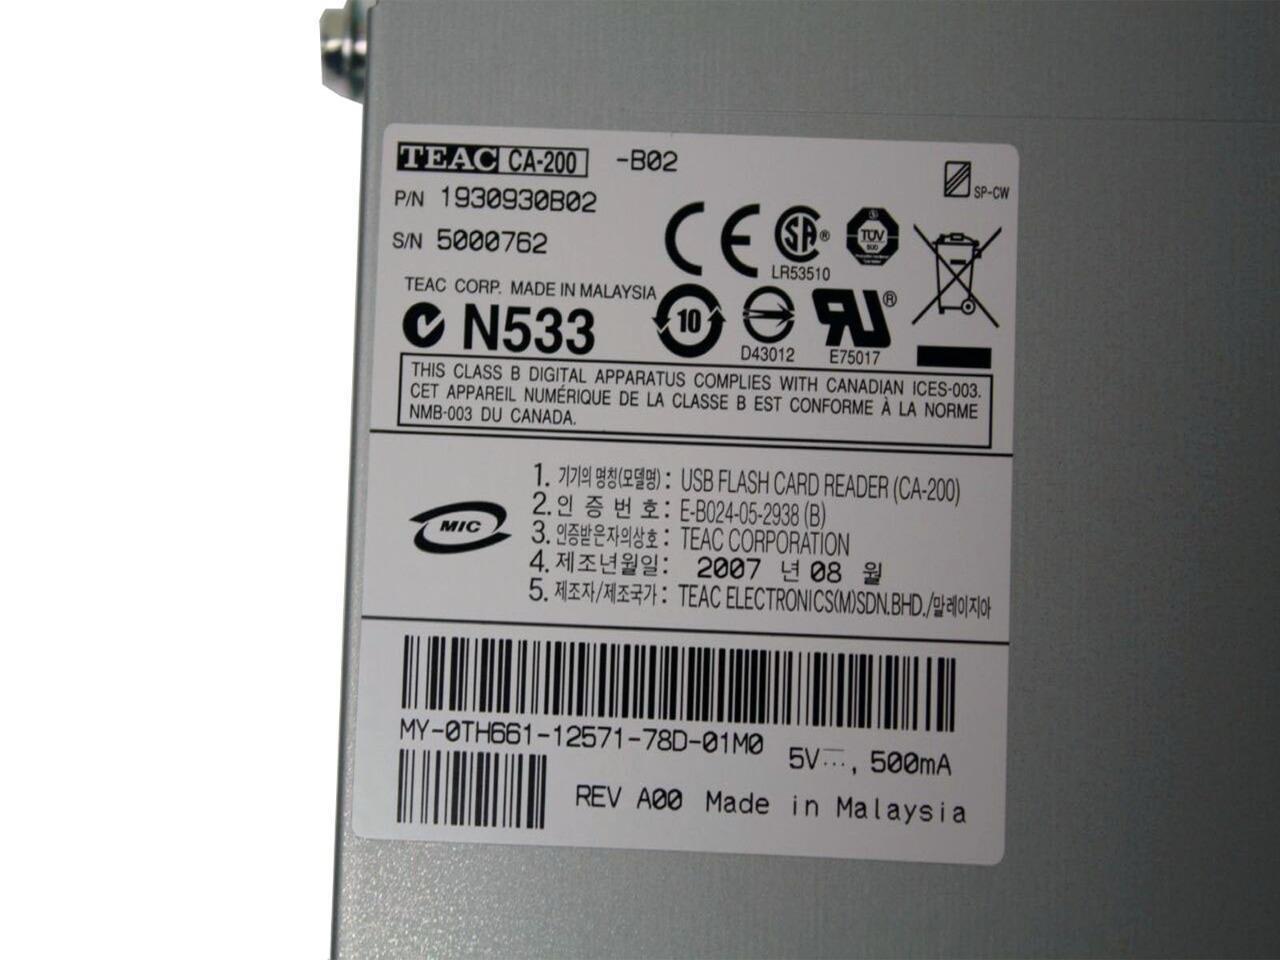 Dell XPS 720 Black TEAC CA-200 Card Reader Drivers for Mac Download